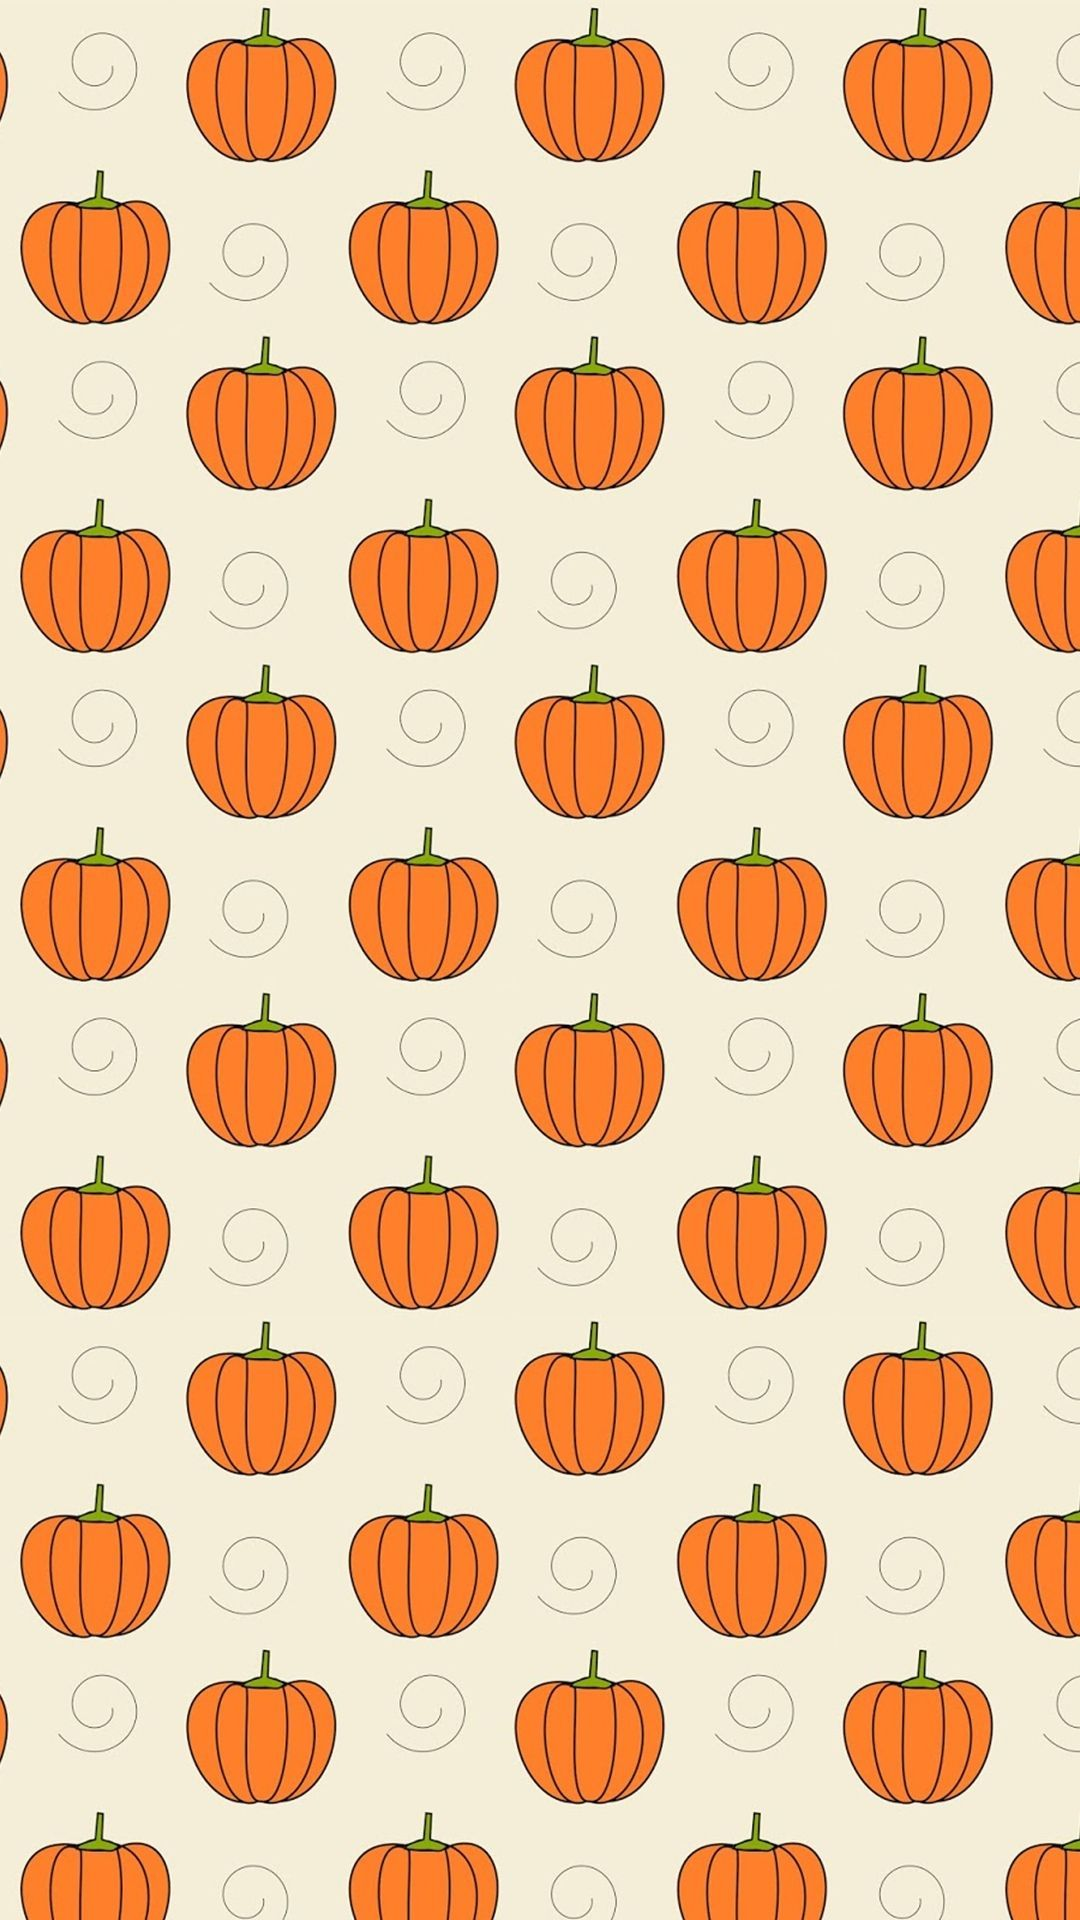 Aesthetic Halloween Wallpaper In 2020 Cute Fall Wallpaper Halloween Wallpaper Pumpkin Wallpaper